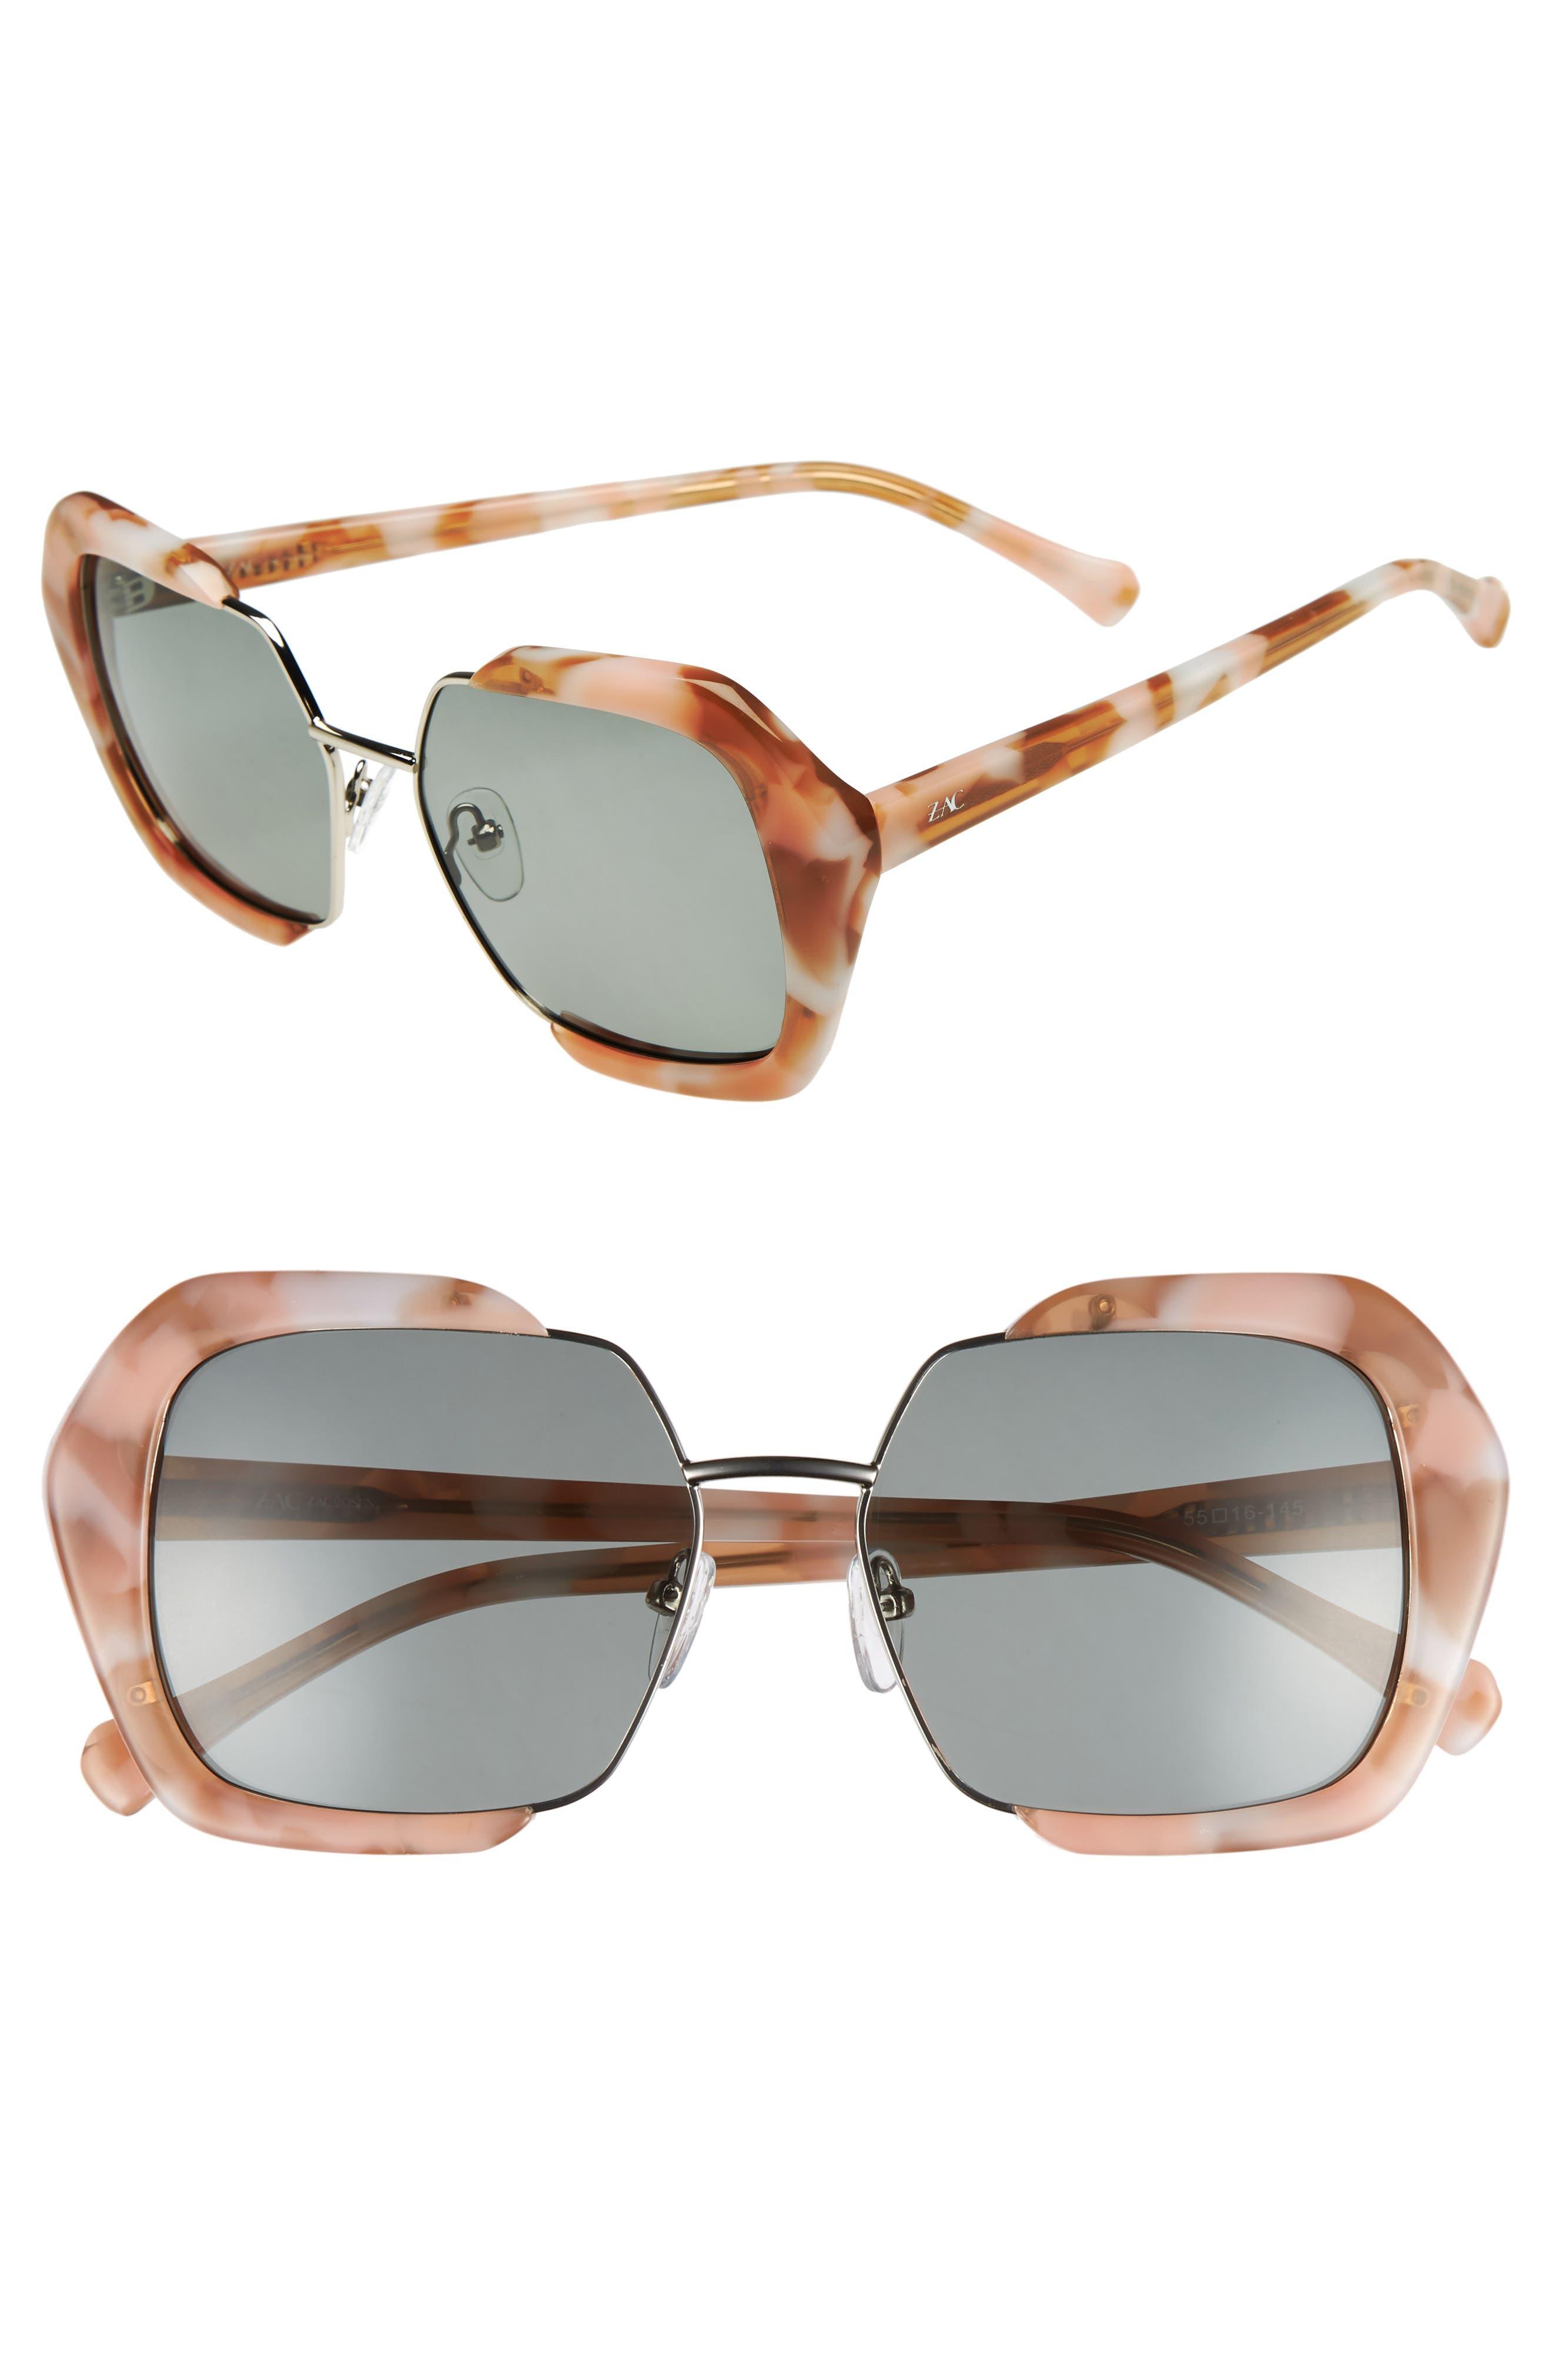 Isleen 55mm Polarized Sunglasses,                             Main thumbnail 1, color,                             Pink/ Tortoise/ Gold